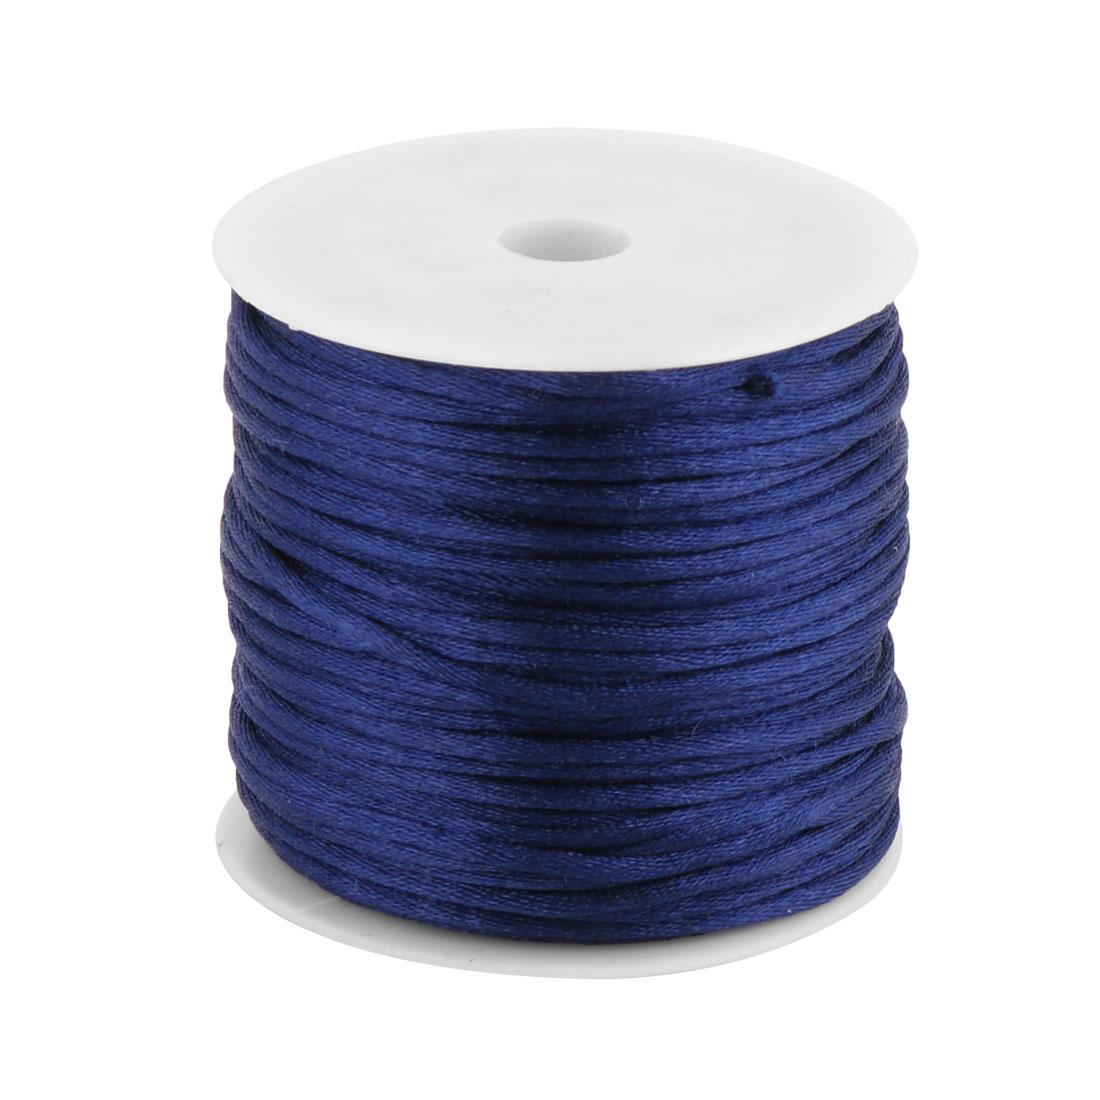 Nylon Handicraft Adornment Chinese Knot String Dark Blue 2mm Dia 49 Yards